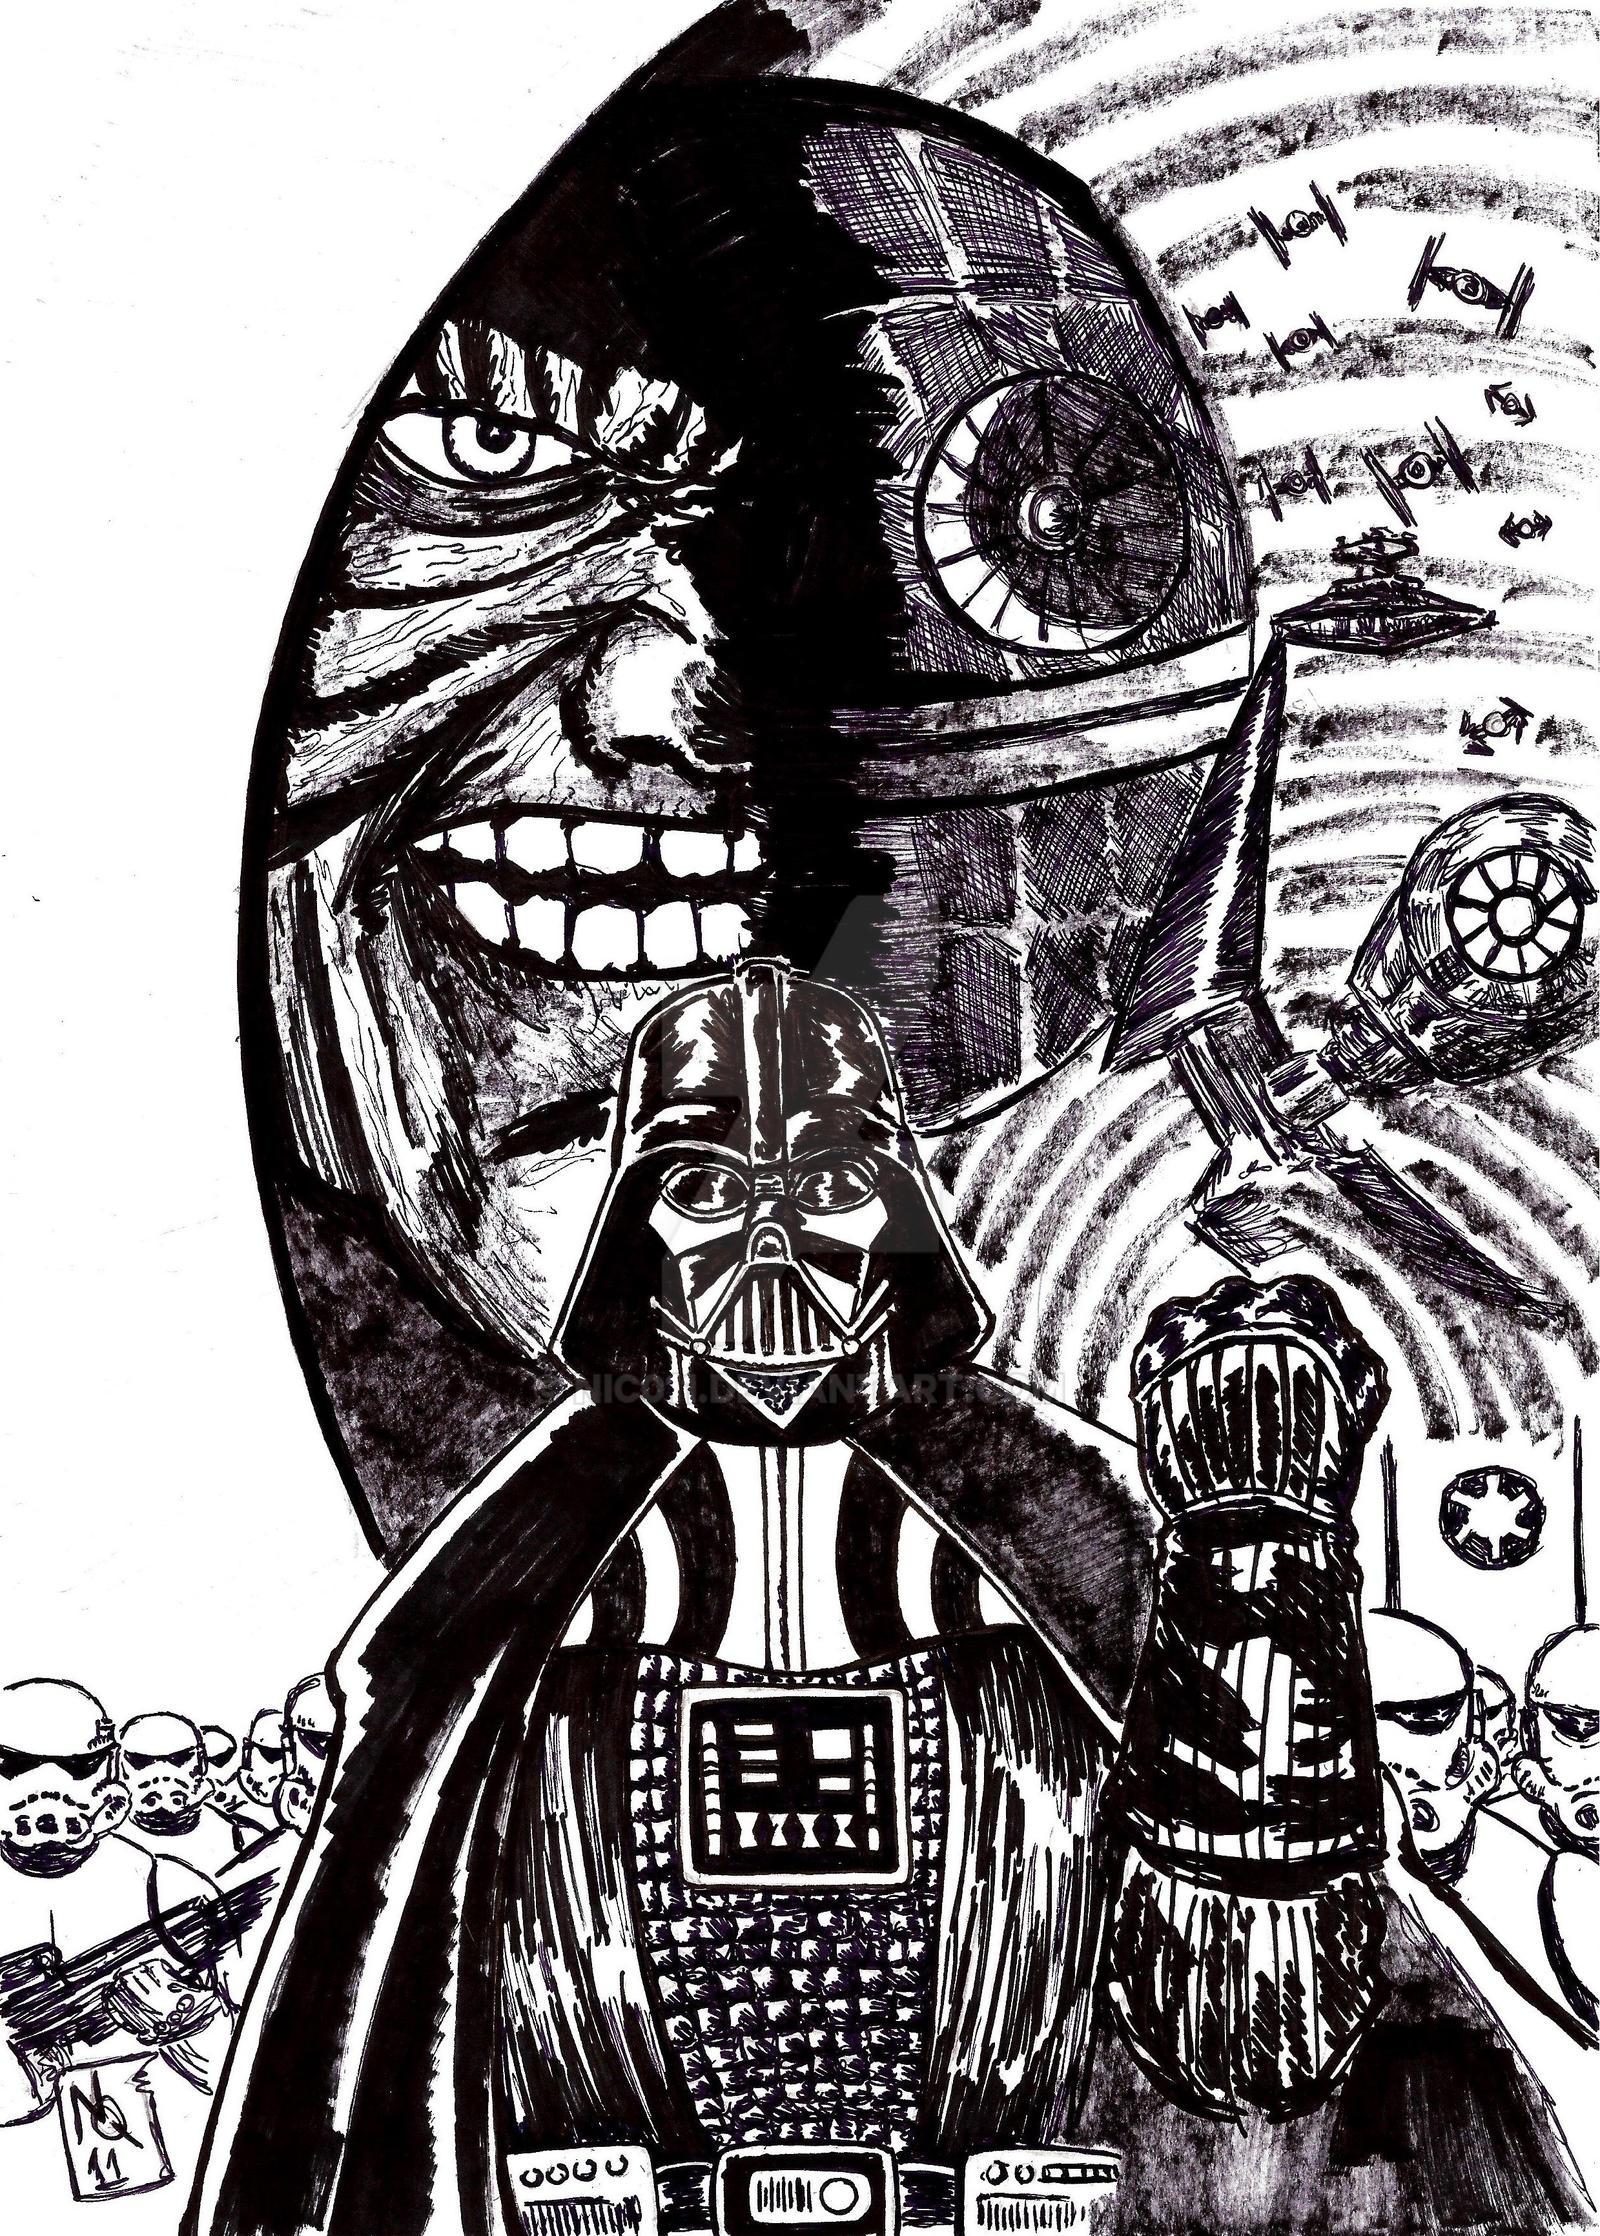 Darth Vader Ink by nic011